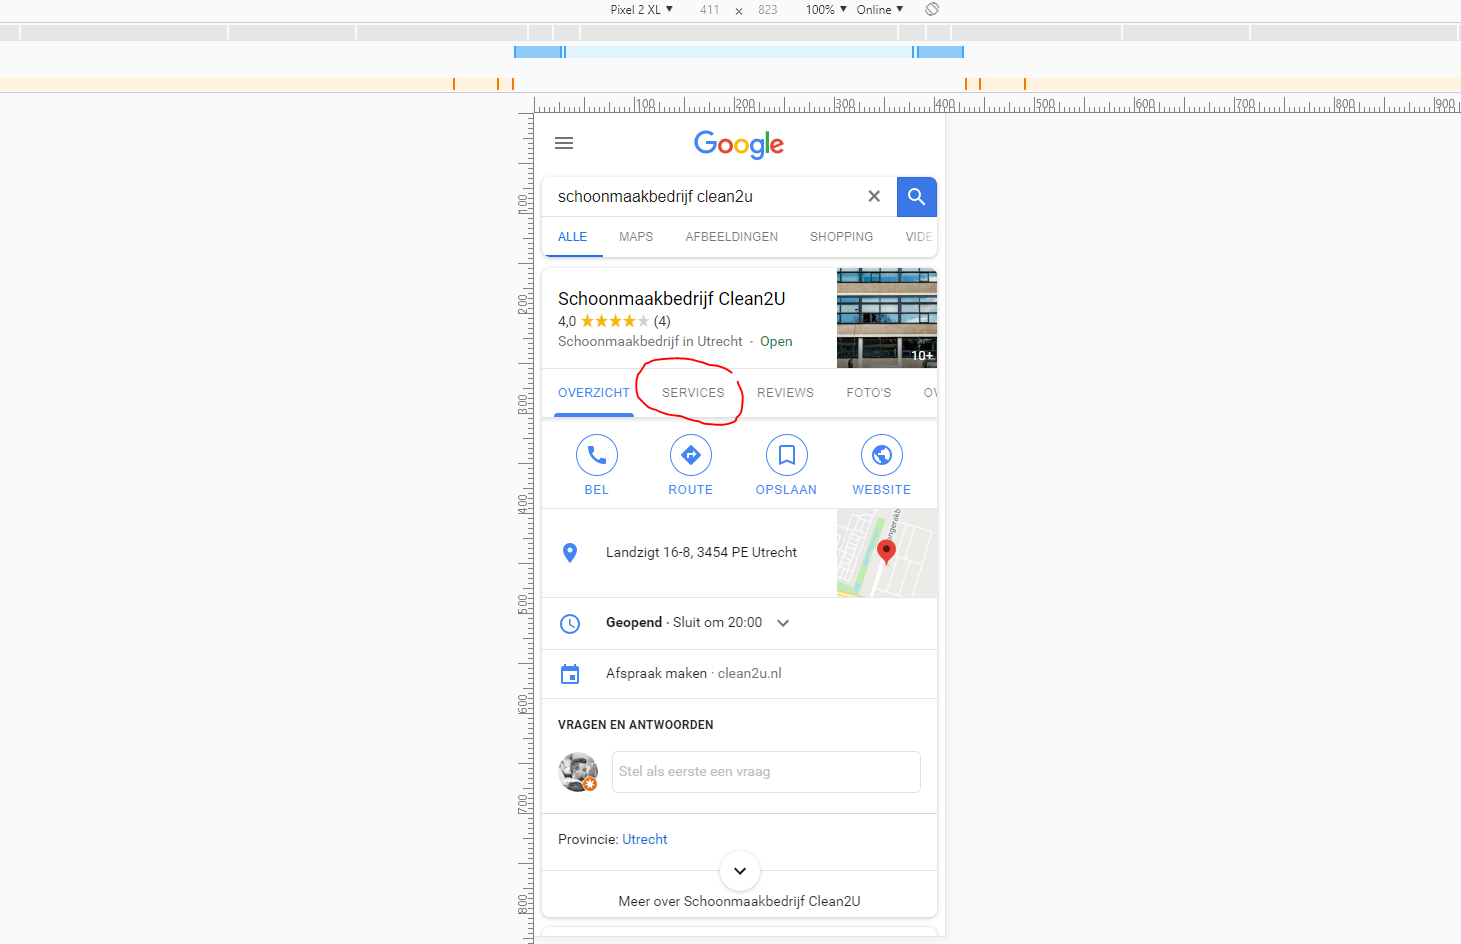 Google Mijn Bedrijf Services op mobiele devices